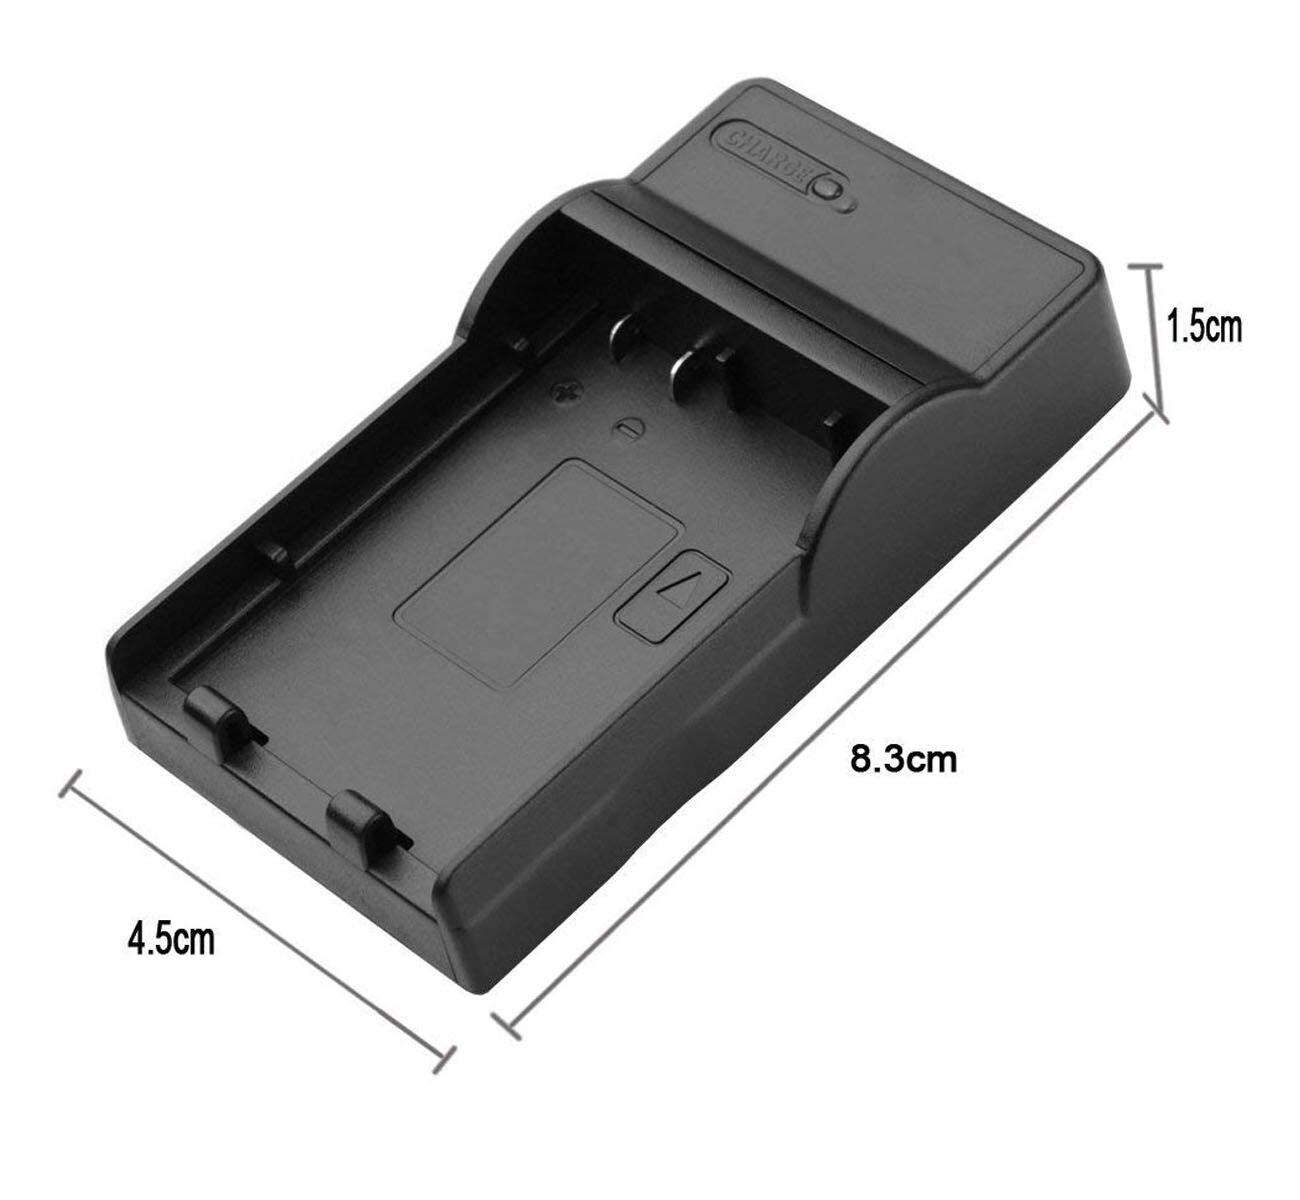 DSTE Ersatzakku NP-FV100 Batterie kompatibel mit Sony HDR-CX115 HDR-CX130 HDR-CX150 HDR-CX155 HDR-CX160 HDR-CX190 HDR-CX200 HDR-CX210 HDR-CX220